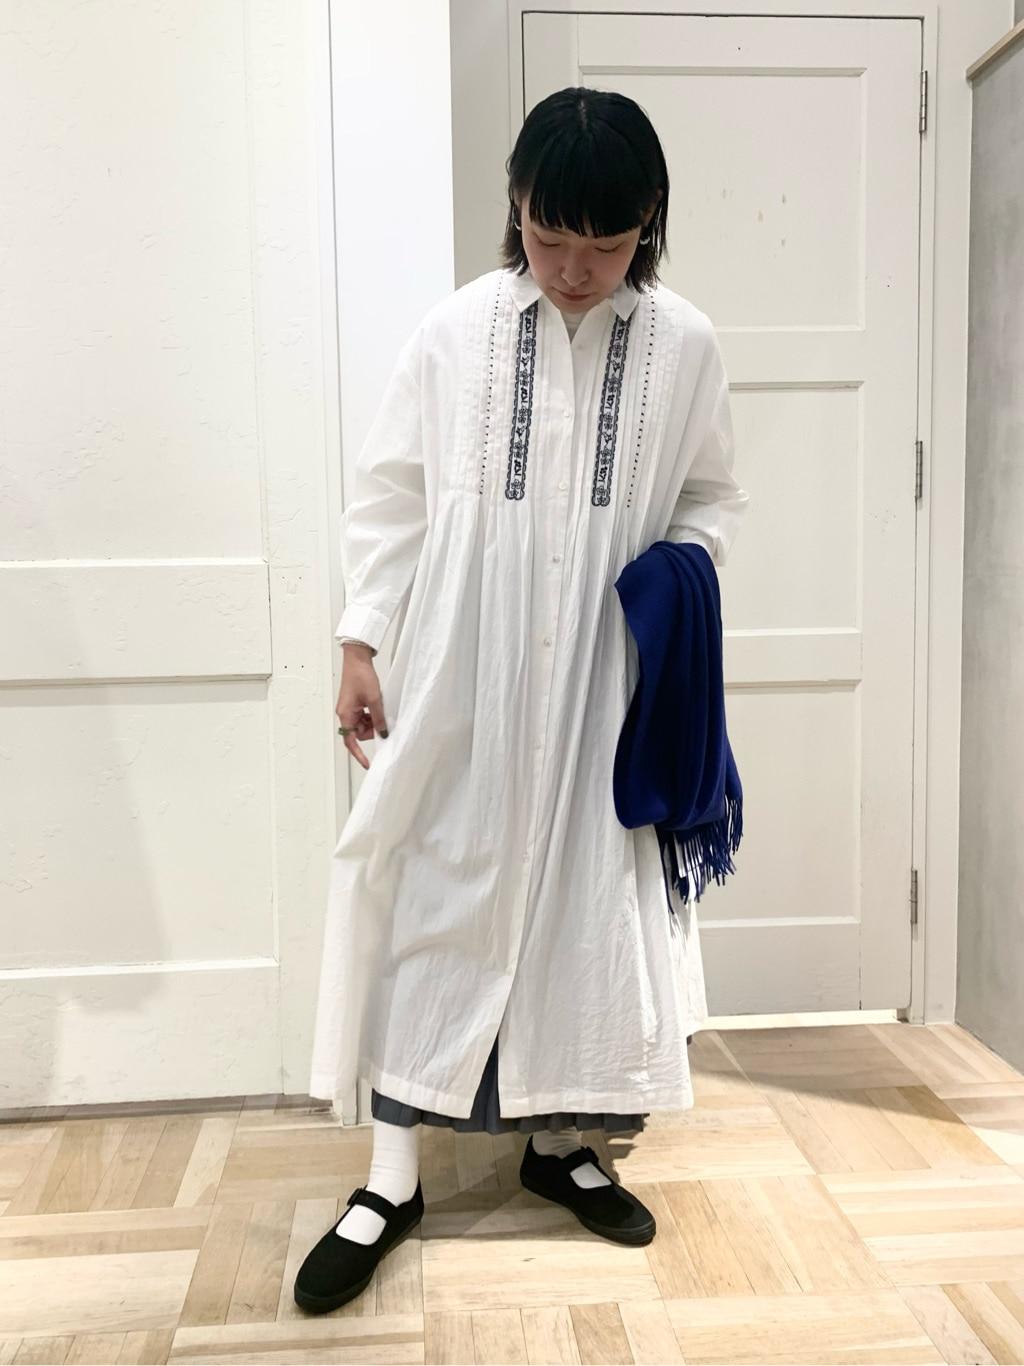 bulle de savon トリエ京王調布 身長:159cm 2020.12.08